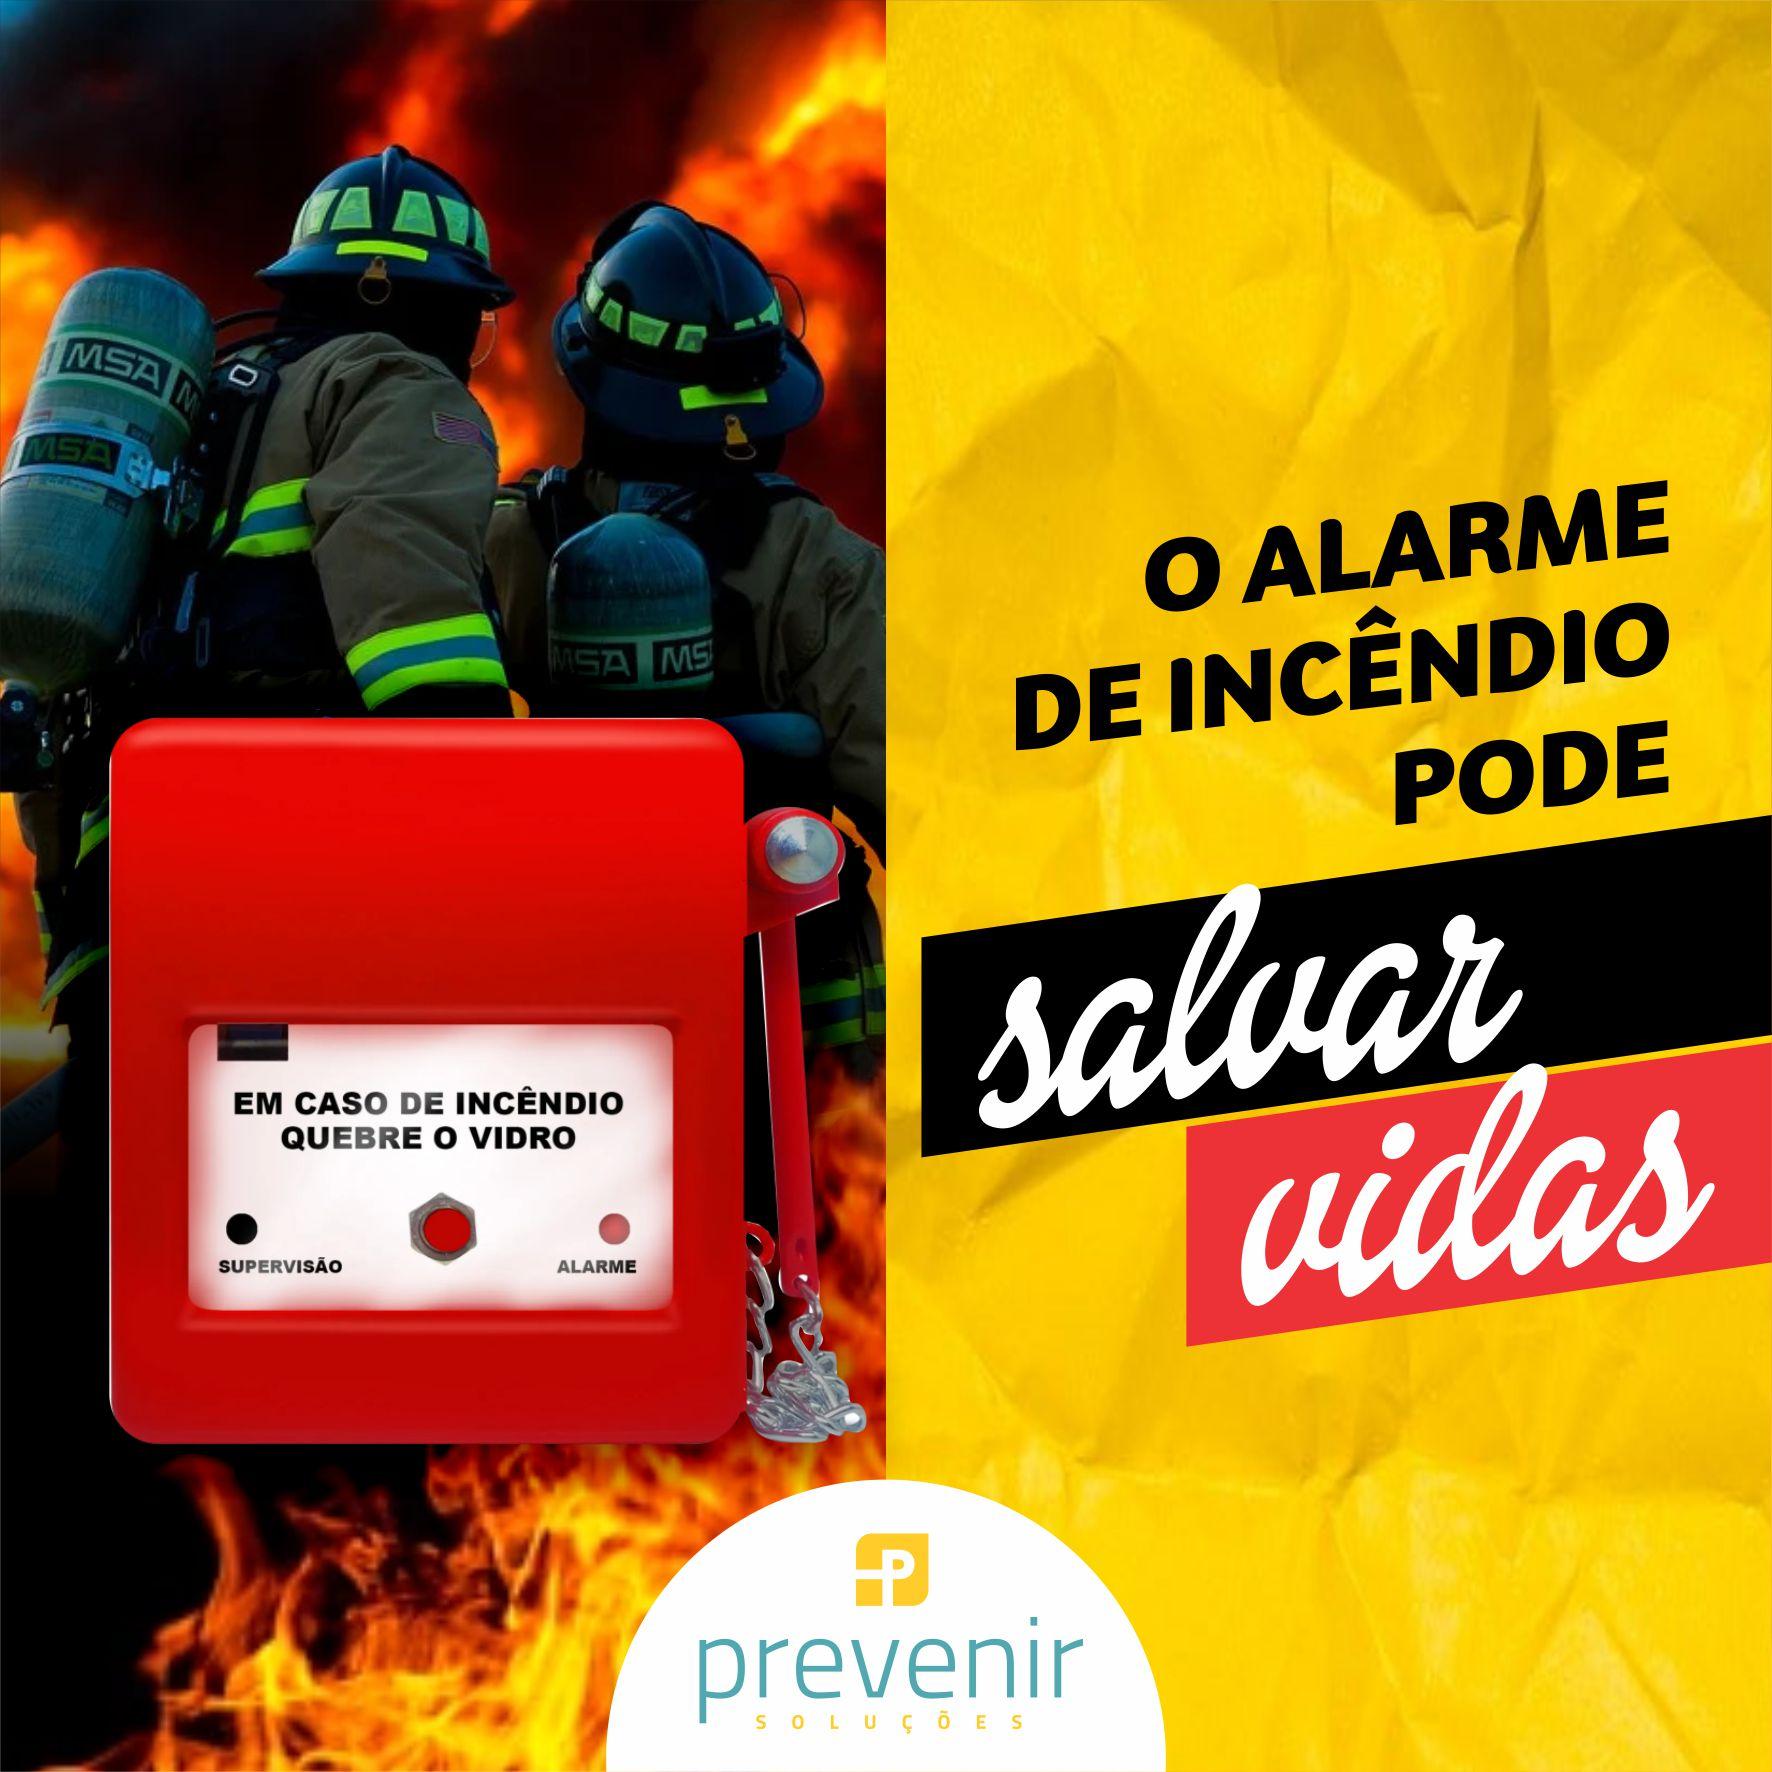 O alarme de incêndio preserva a vida humana!